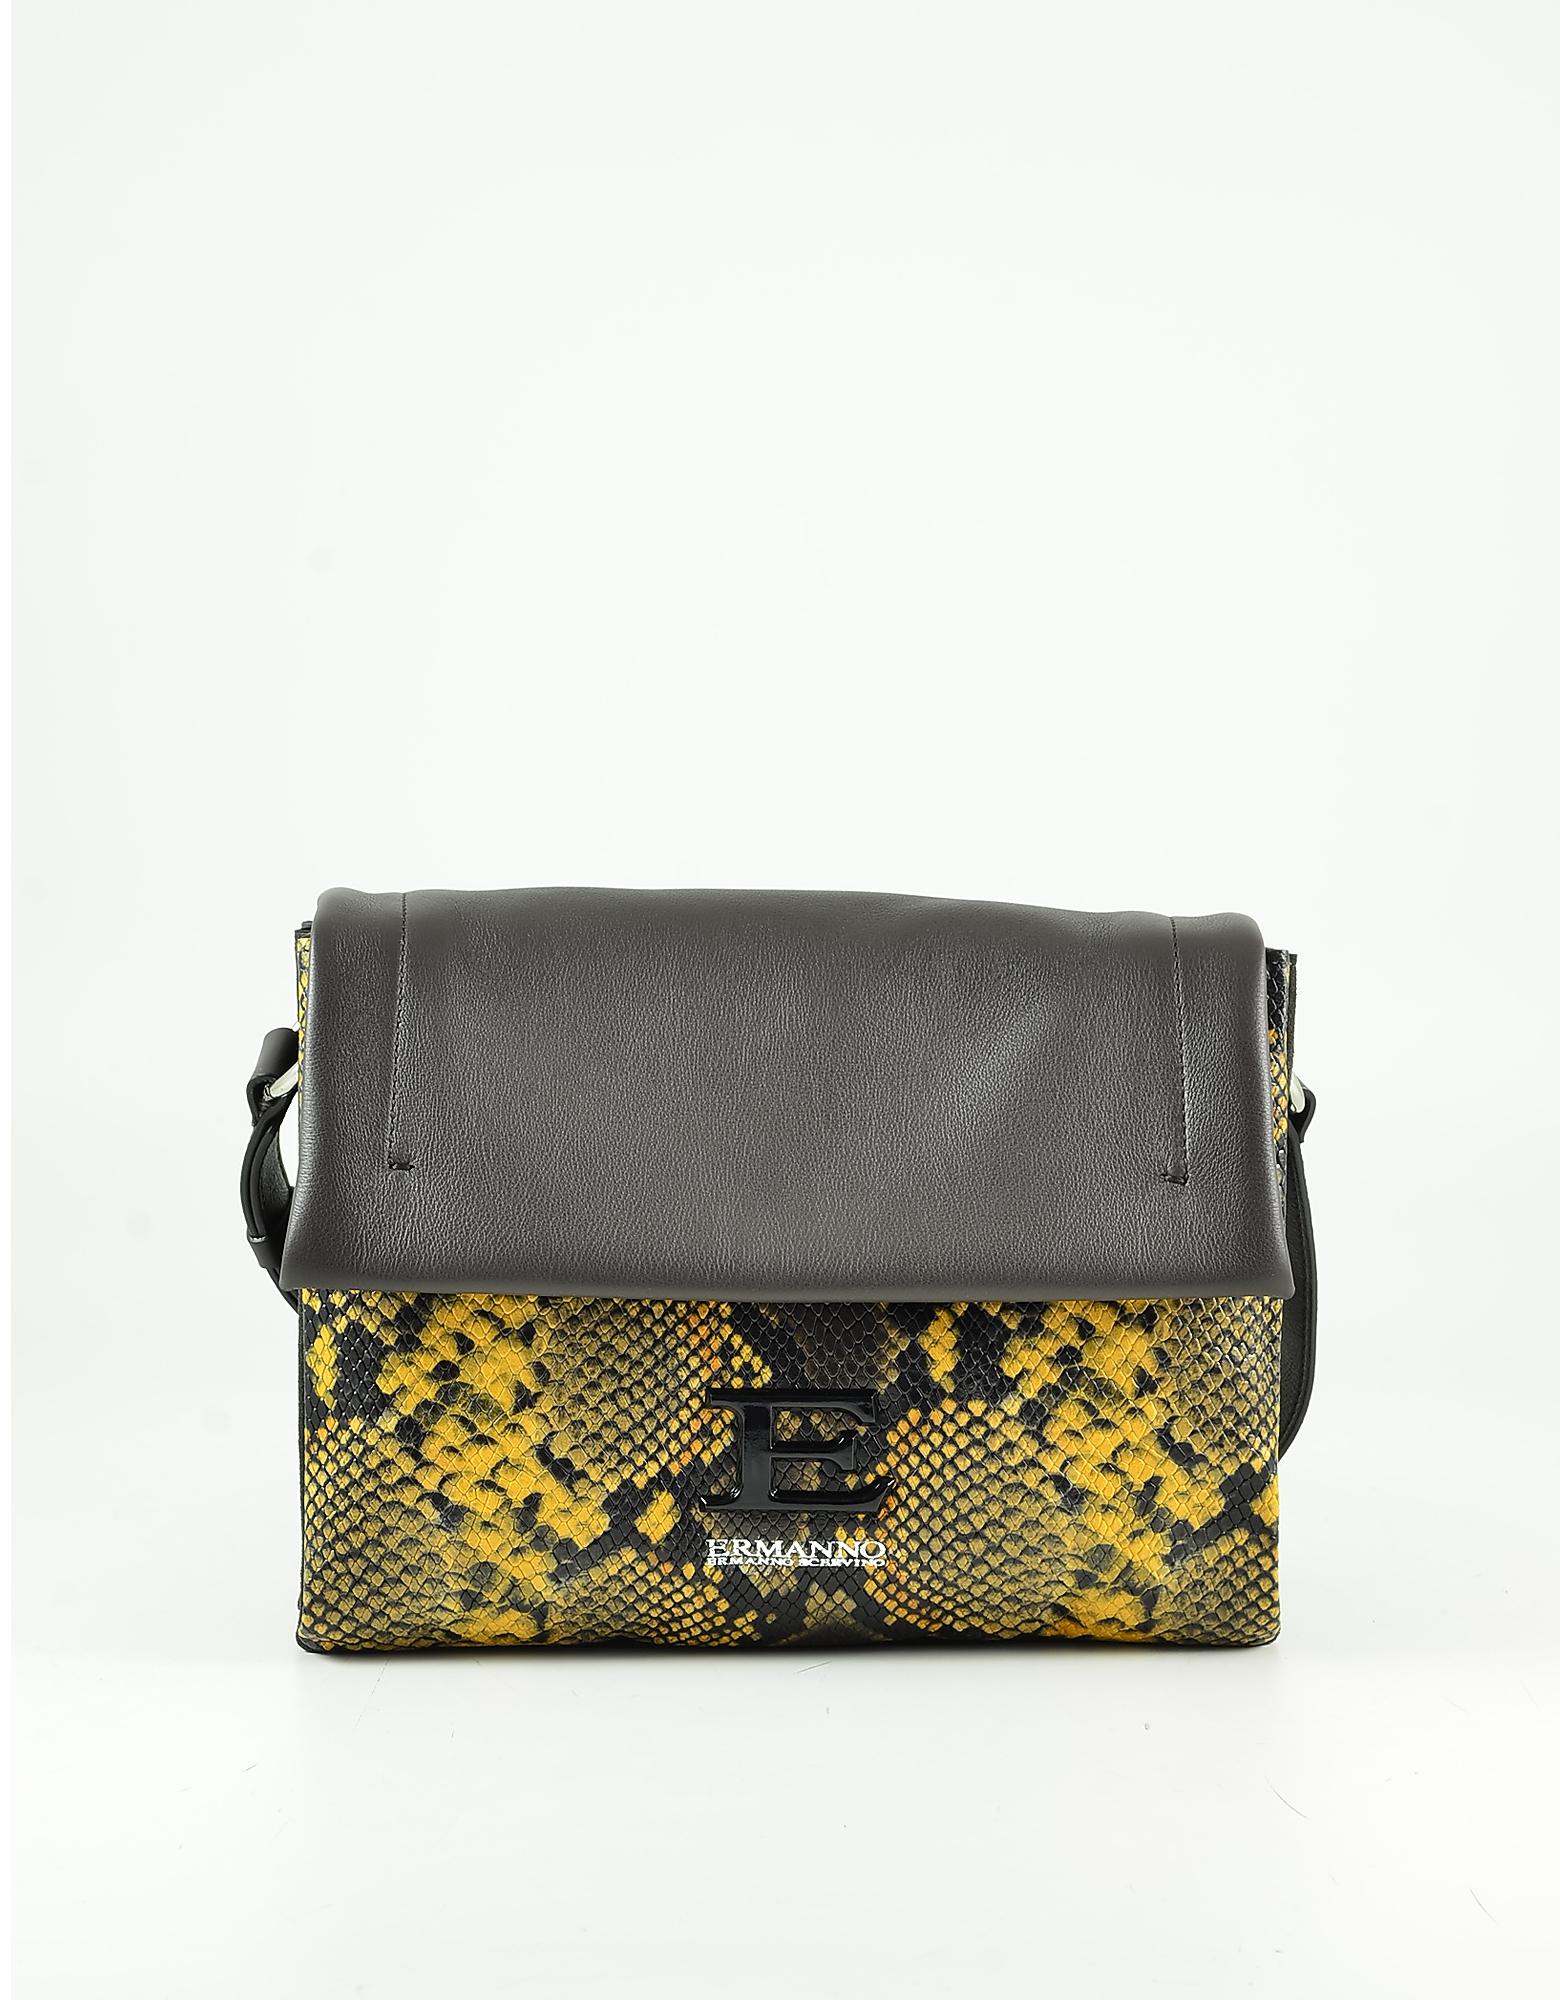 Ermanno Scervino Yellow Python Embossed Leather Shoulder Bag